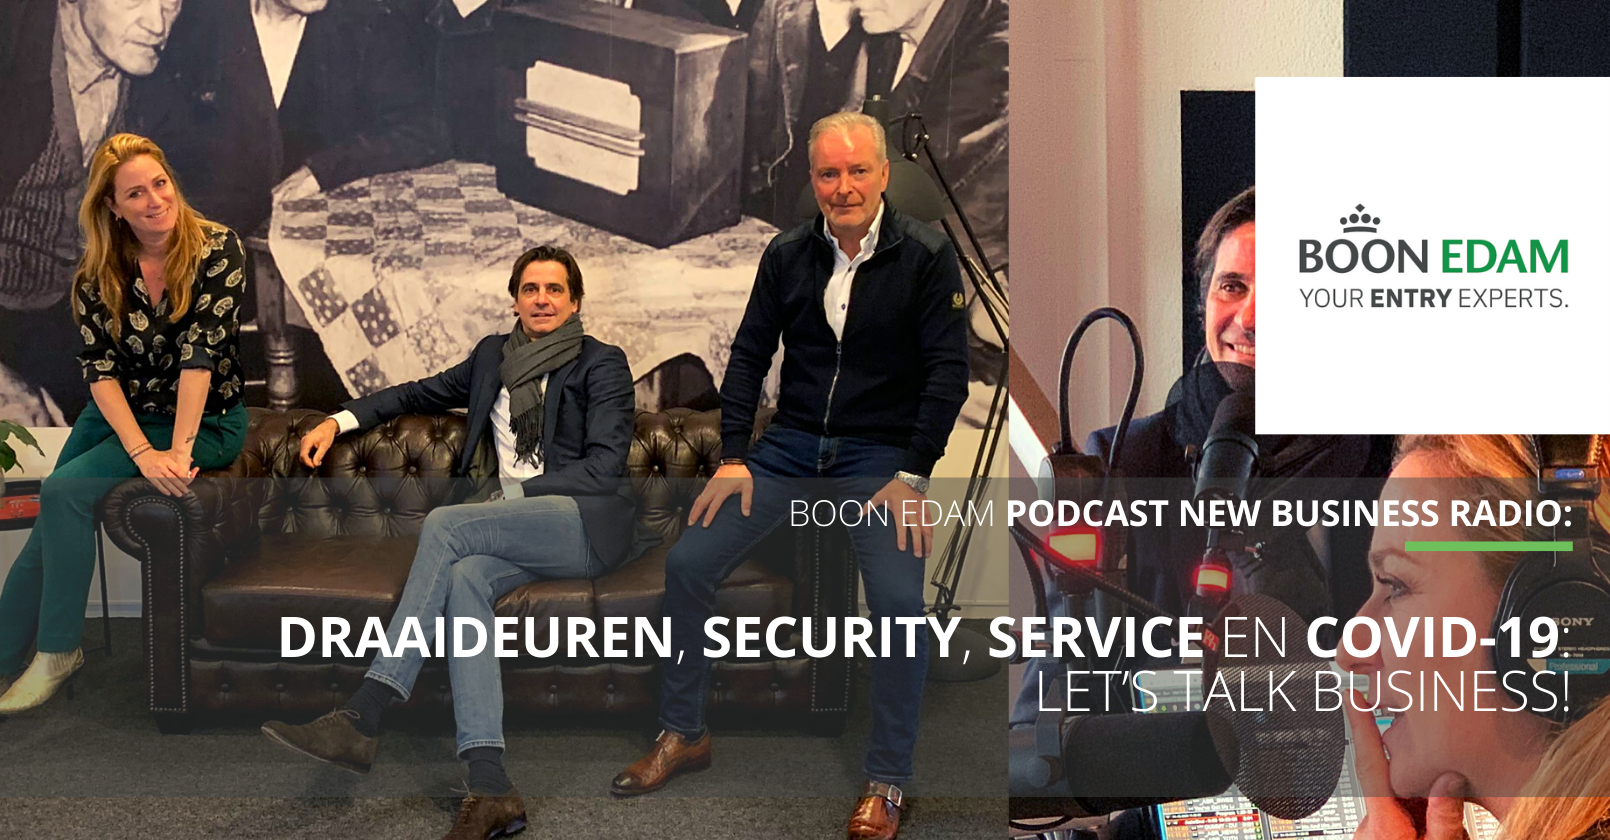 Podcast: Draaideuren, Security, Service en COVID-19 - Let's Talk Business! | Boon Edam